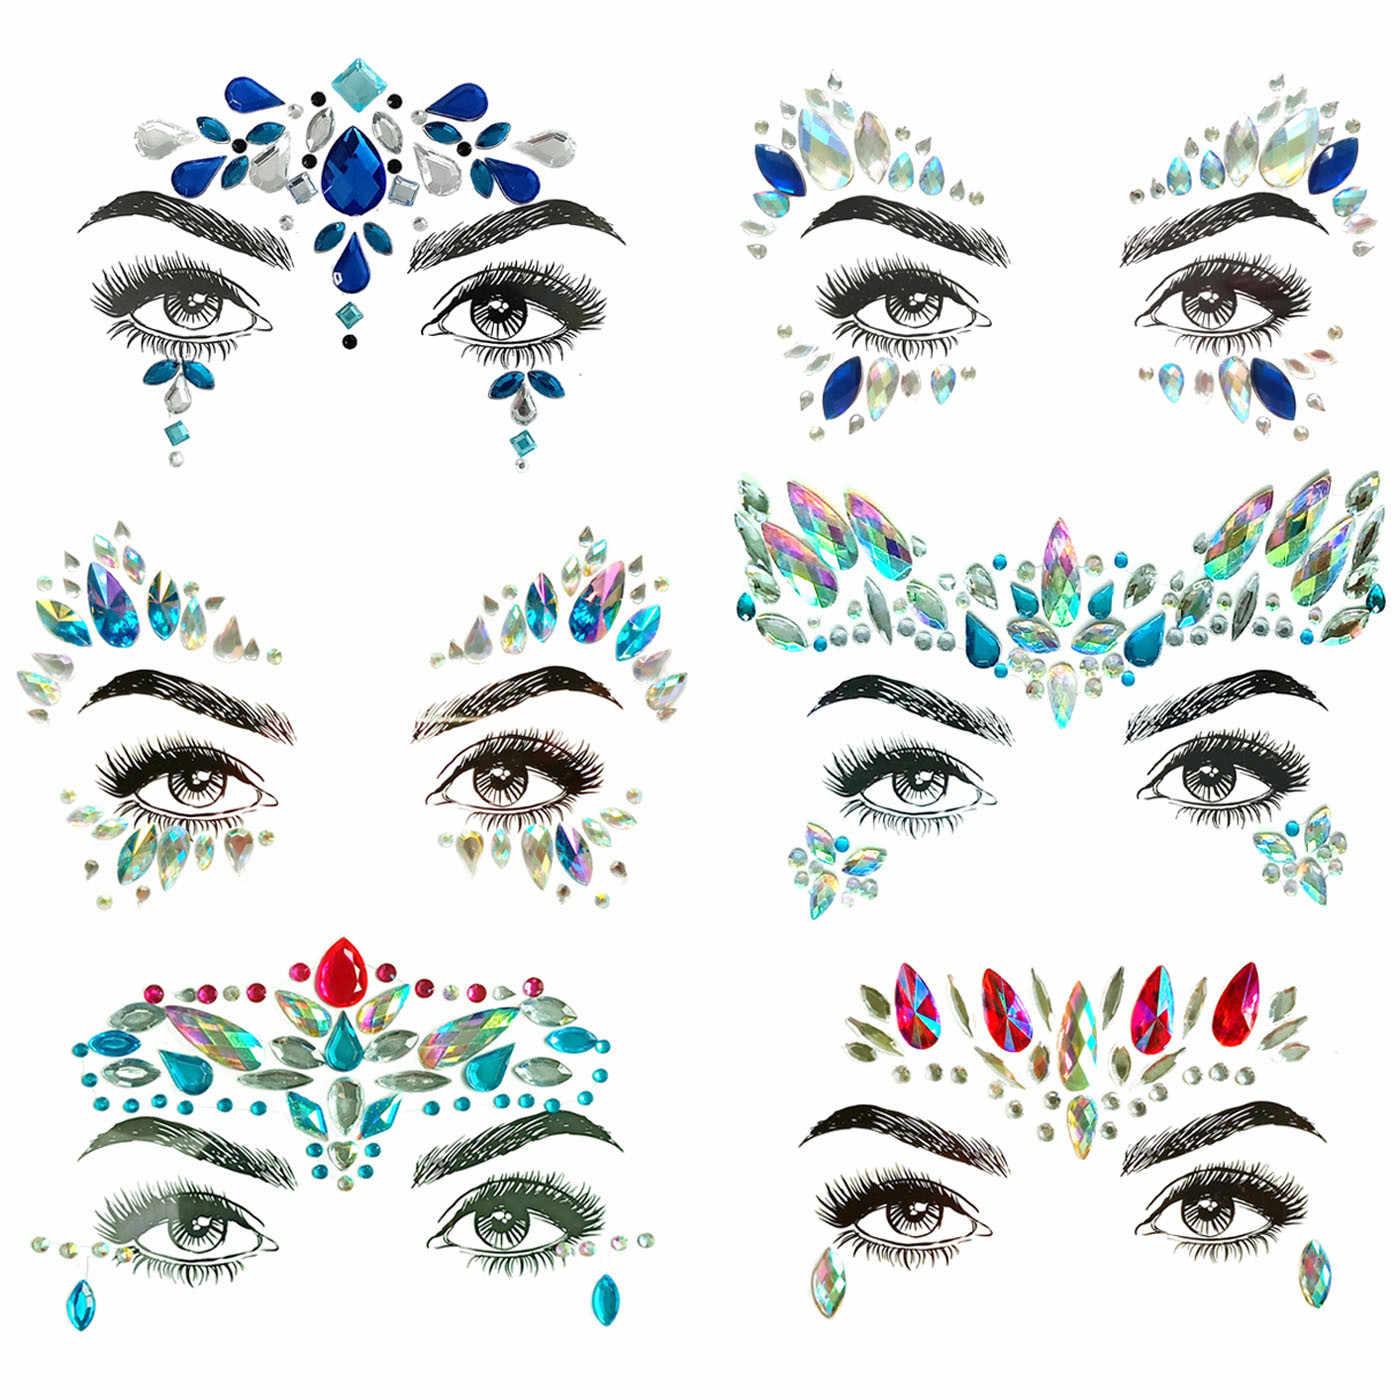 d271039018 1PC Christmas DIY Eyebrow Face Body Art Adhesive Crystal Glitter Jewels  Festival Party Eye Tattoo Stickers Makeup Xmas Decor